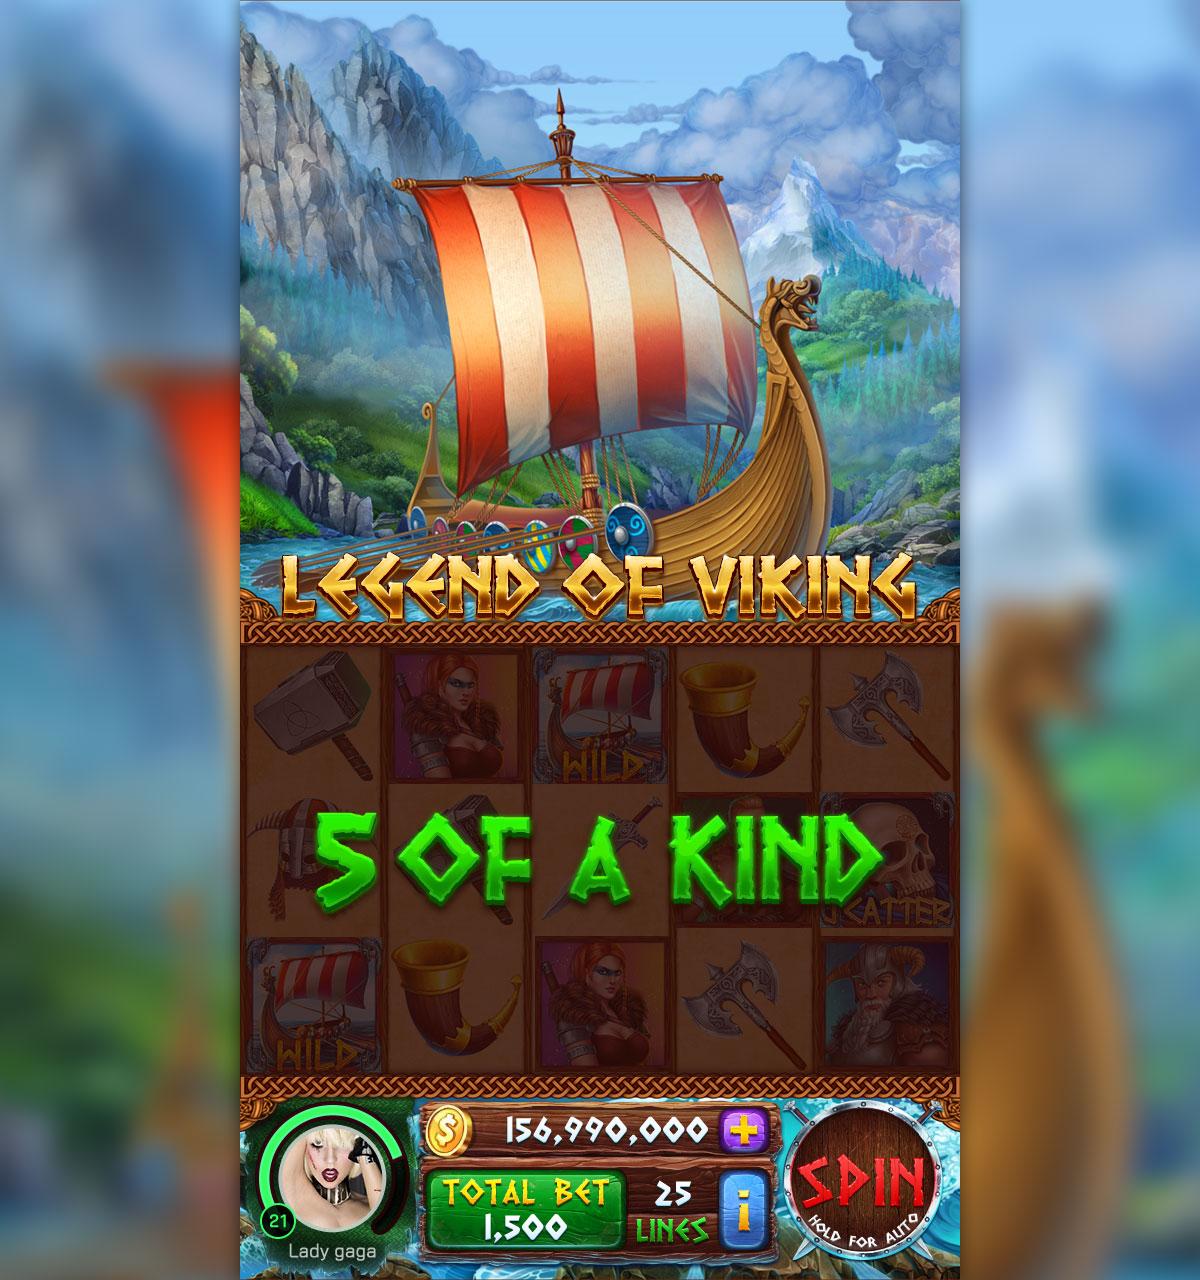 legend_of_viking_blog_5oak